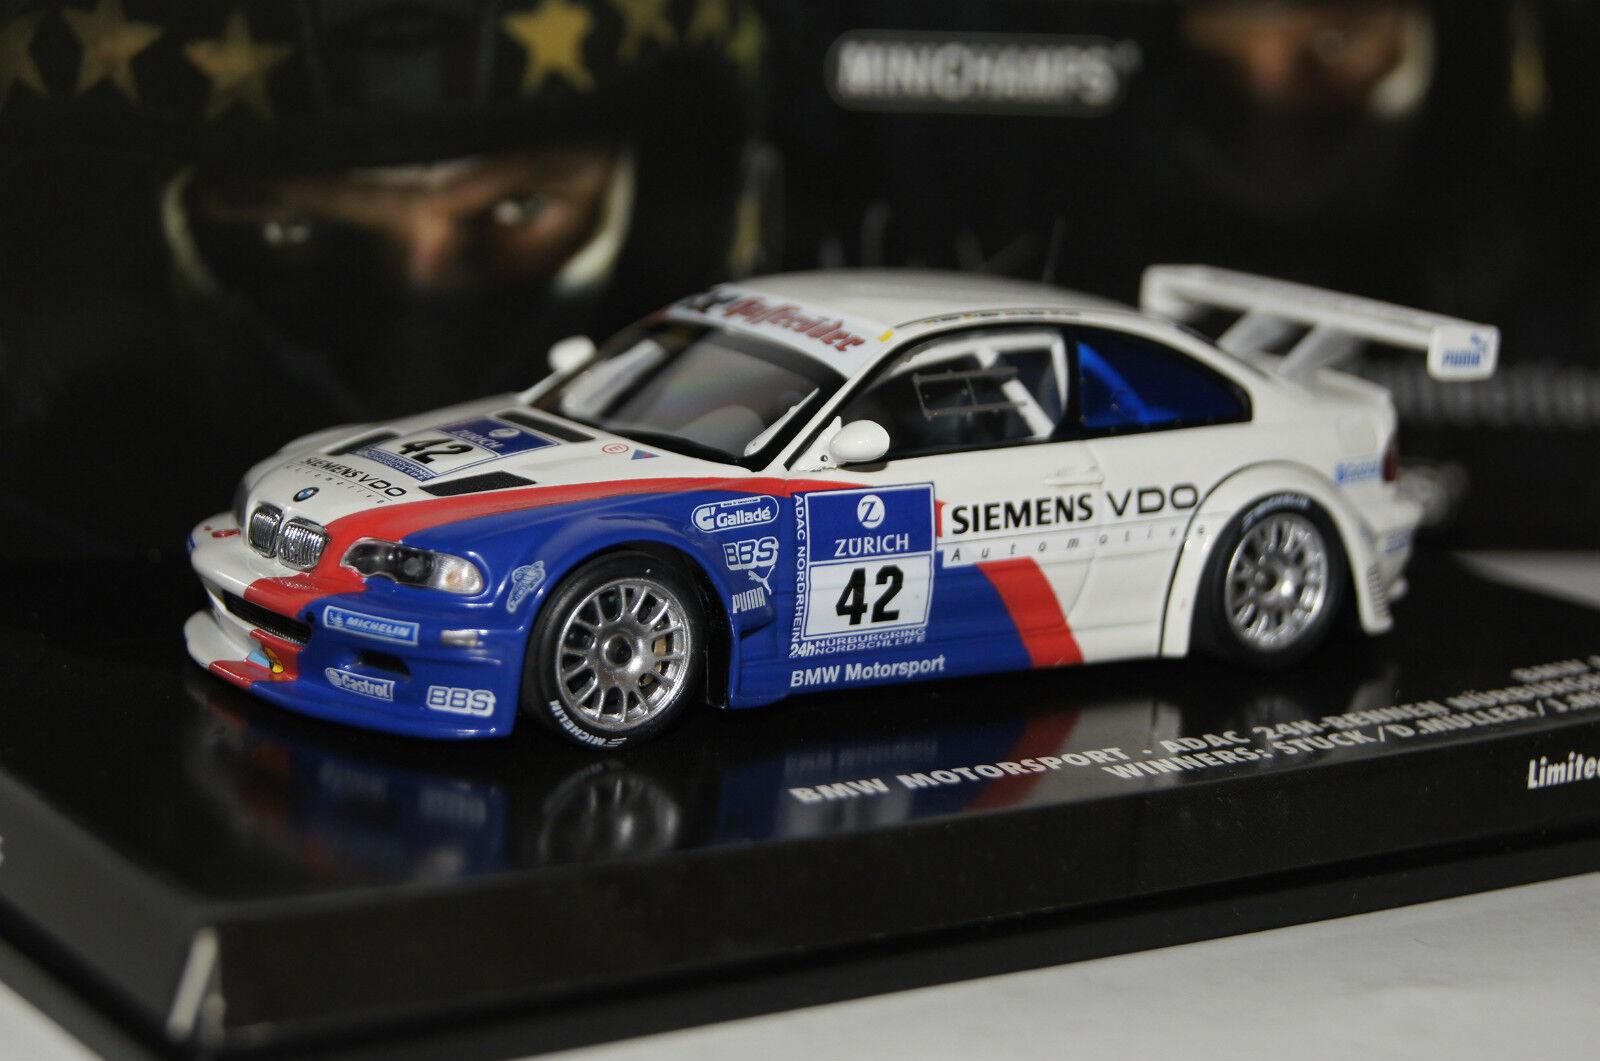 Bmw m3 GTR nurburgring 2004 teatro-Edition 1 43 Minichamps nuevo & OVP 444042342